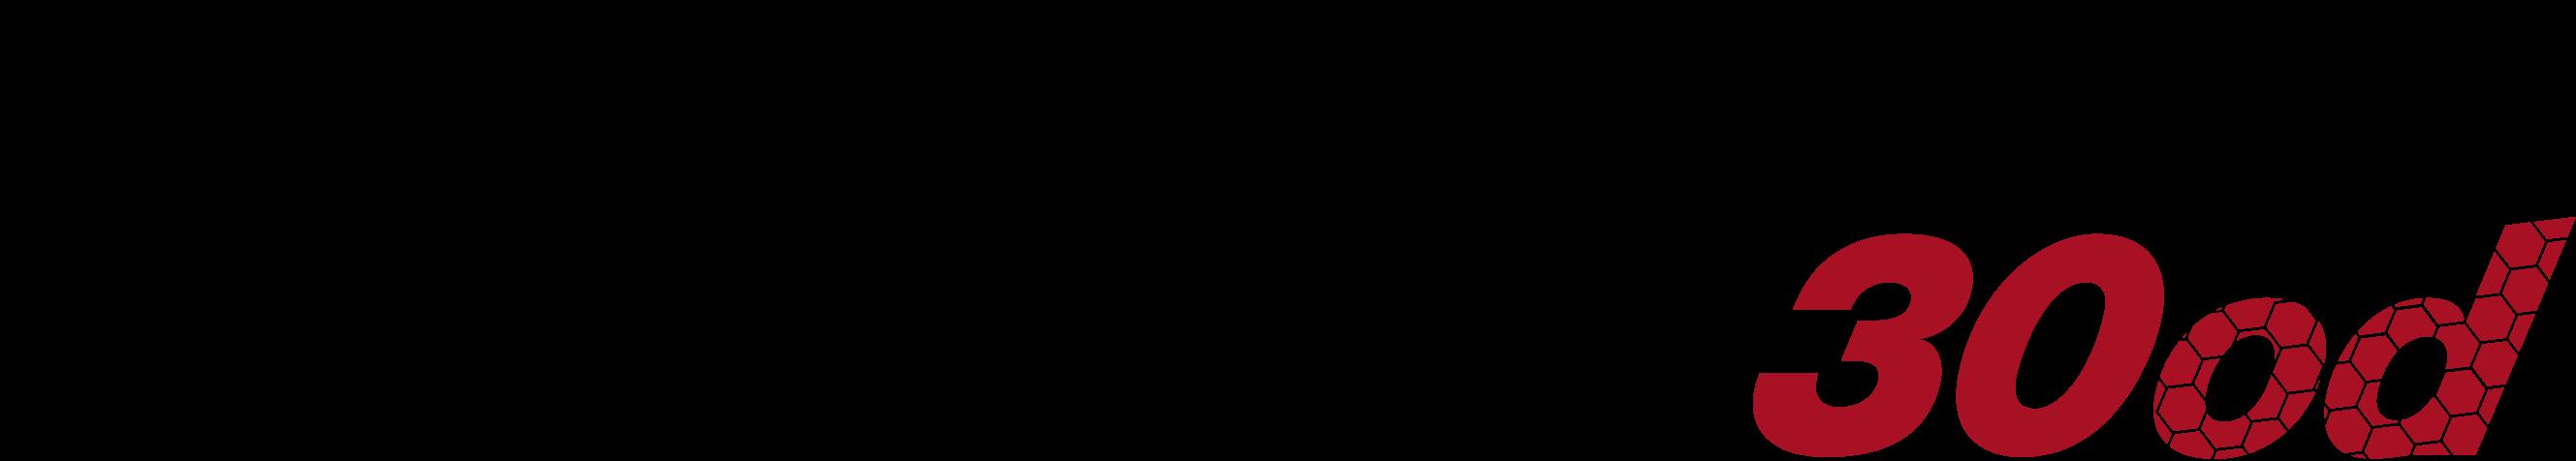 Dehler_Logo_30od_mit_Segel.png